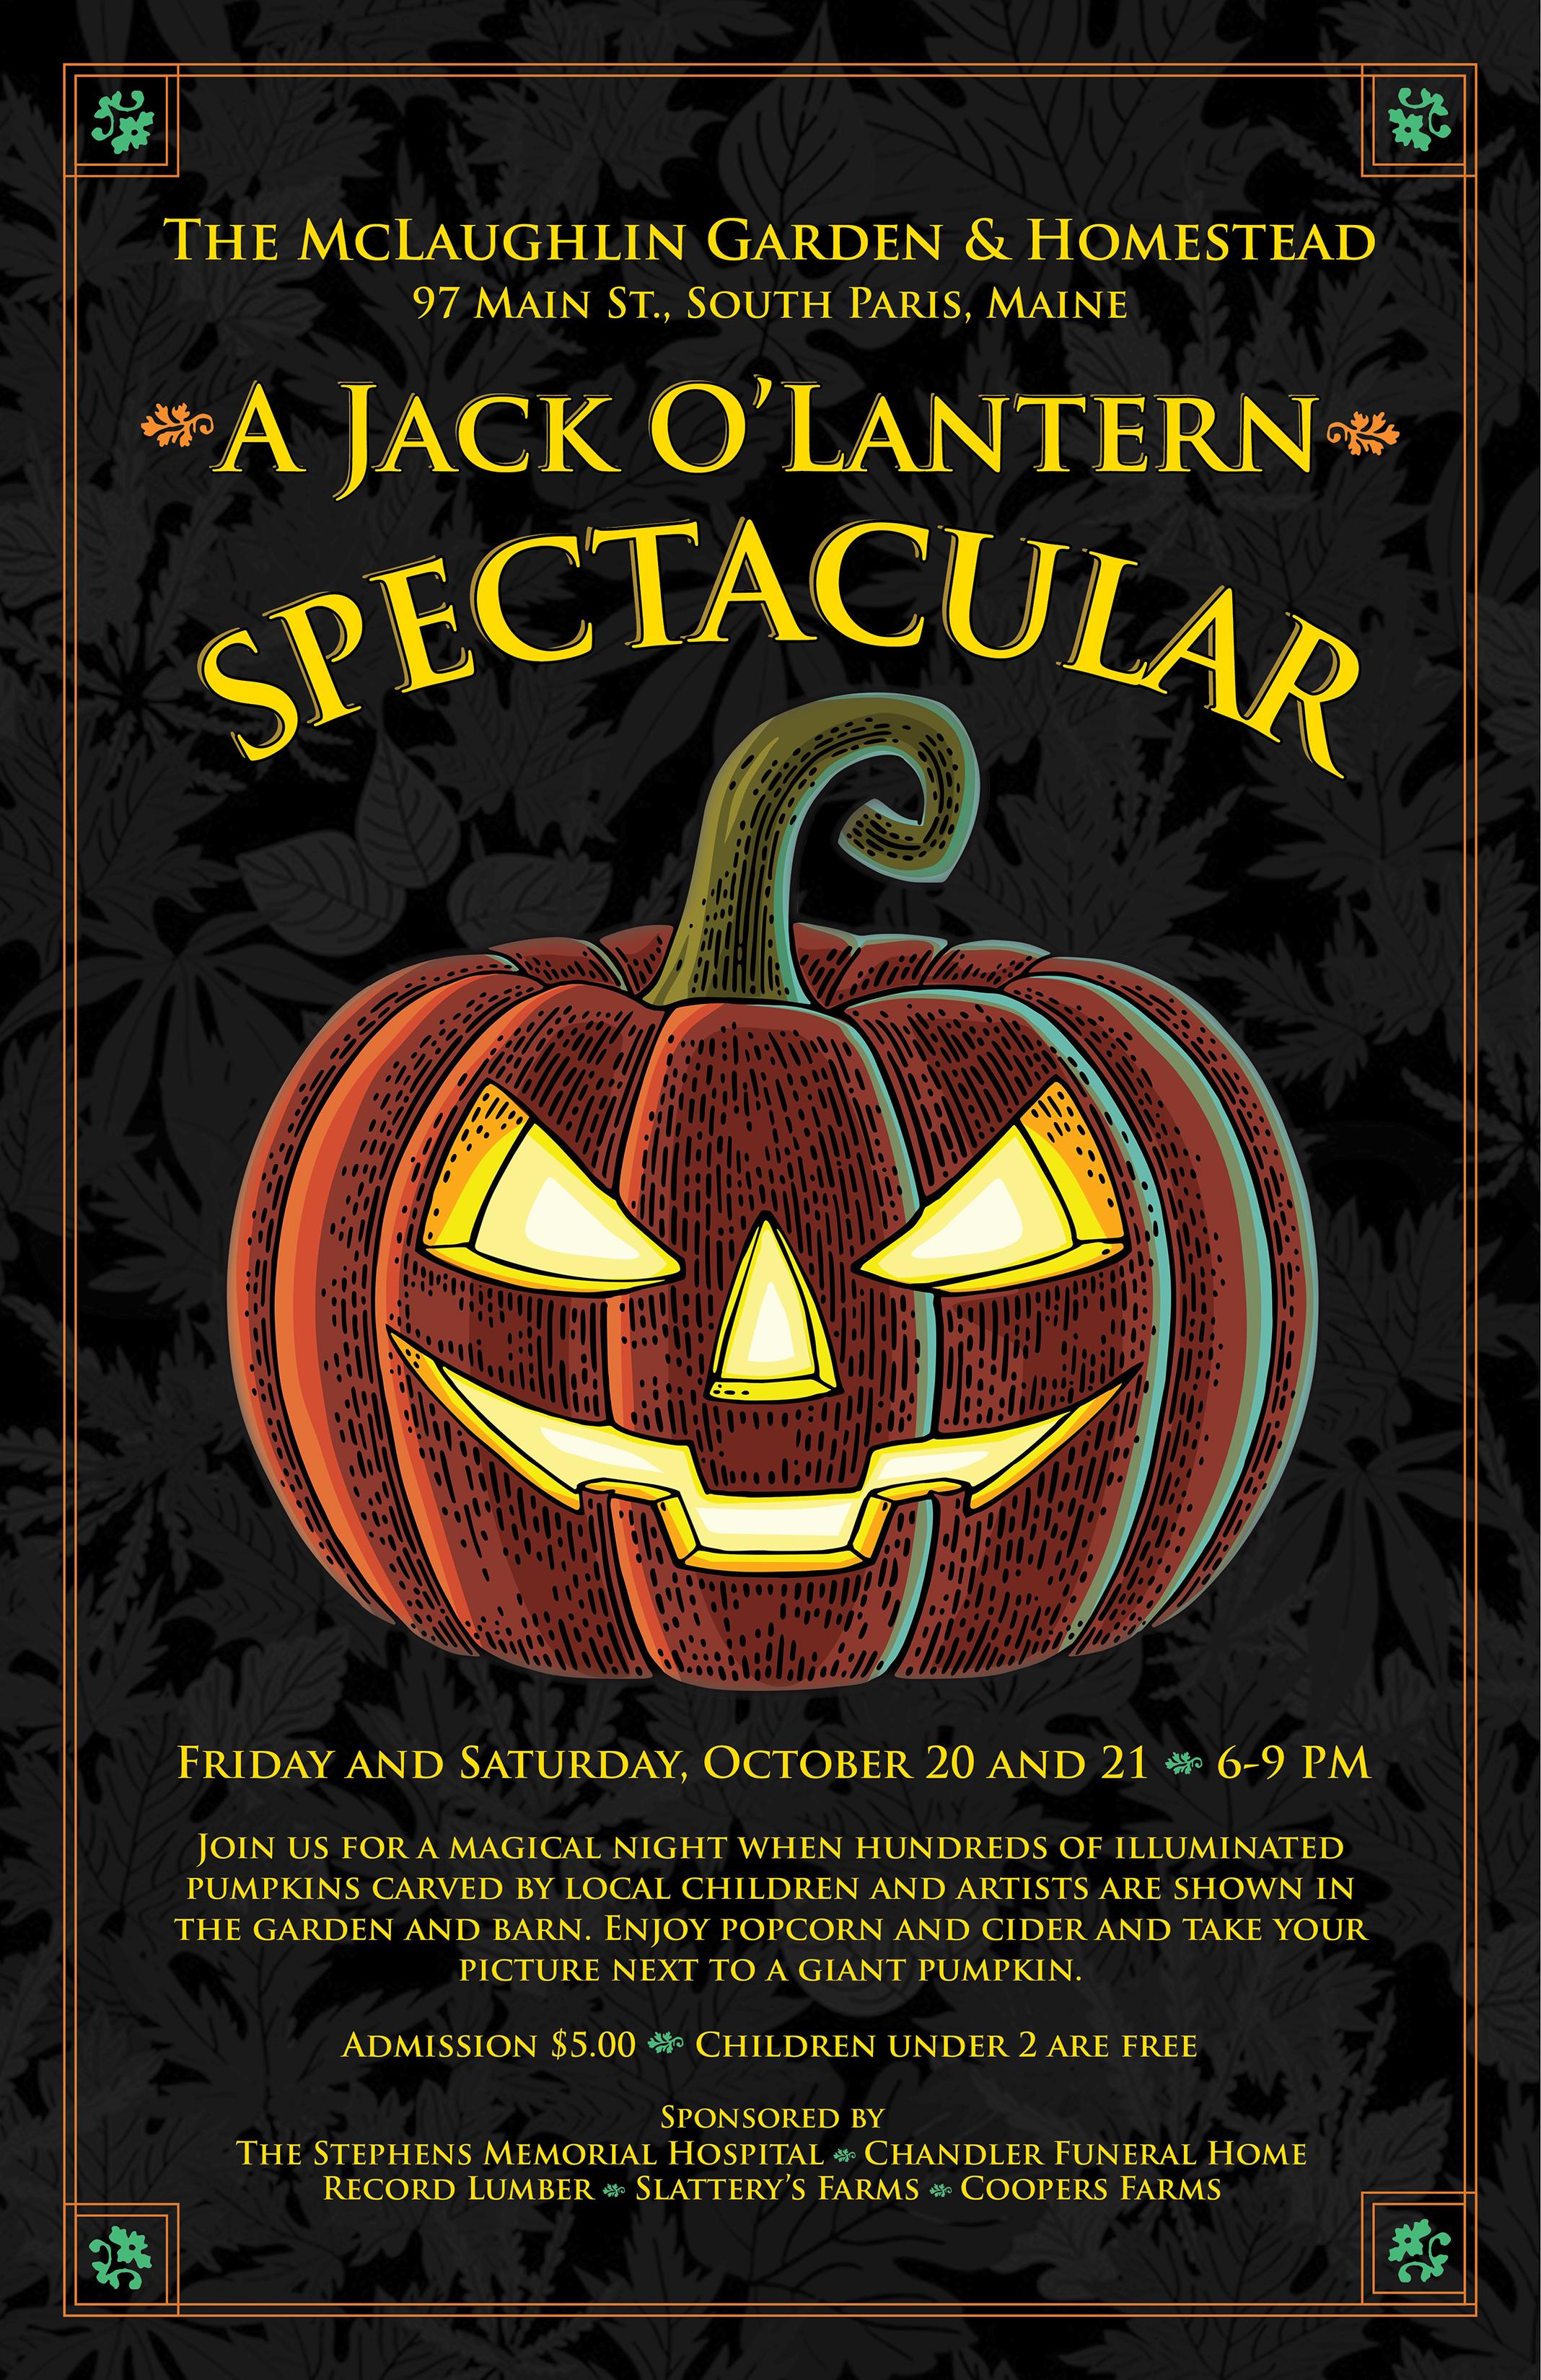 Event poster for McLaughlin Garden & Homestead   South Paris, Maine